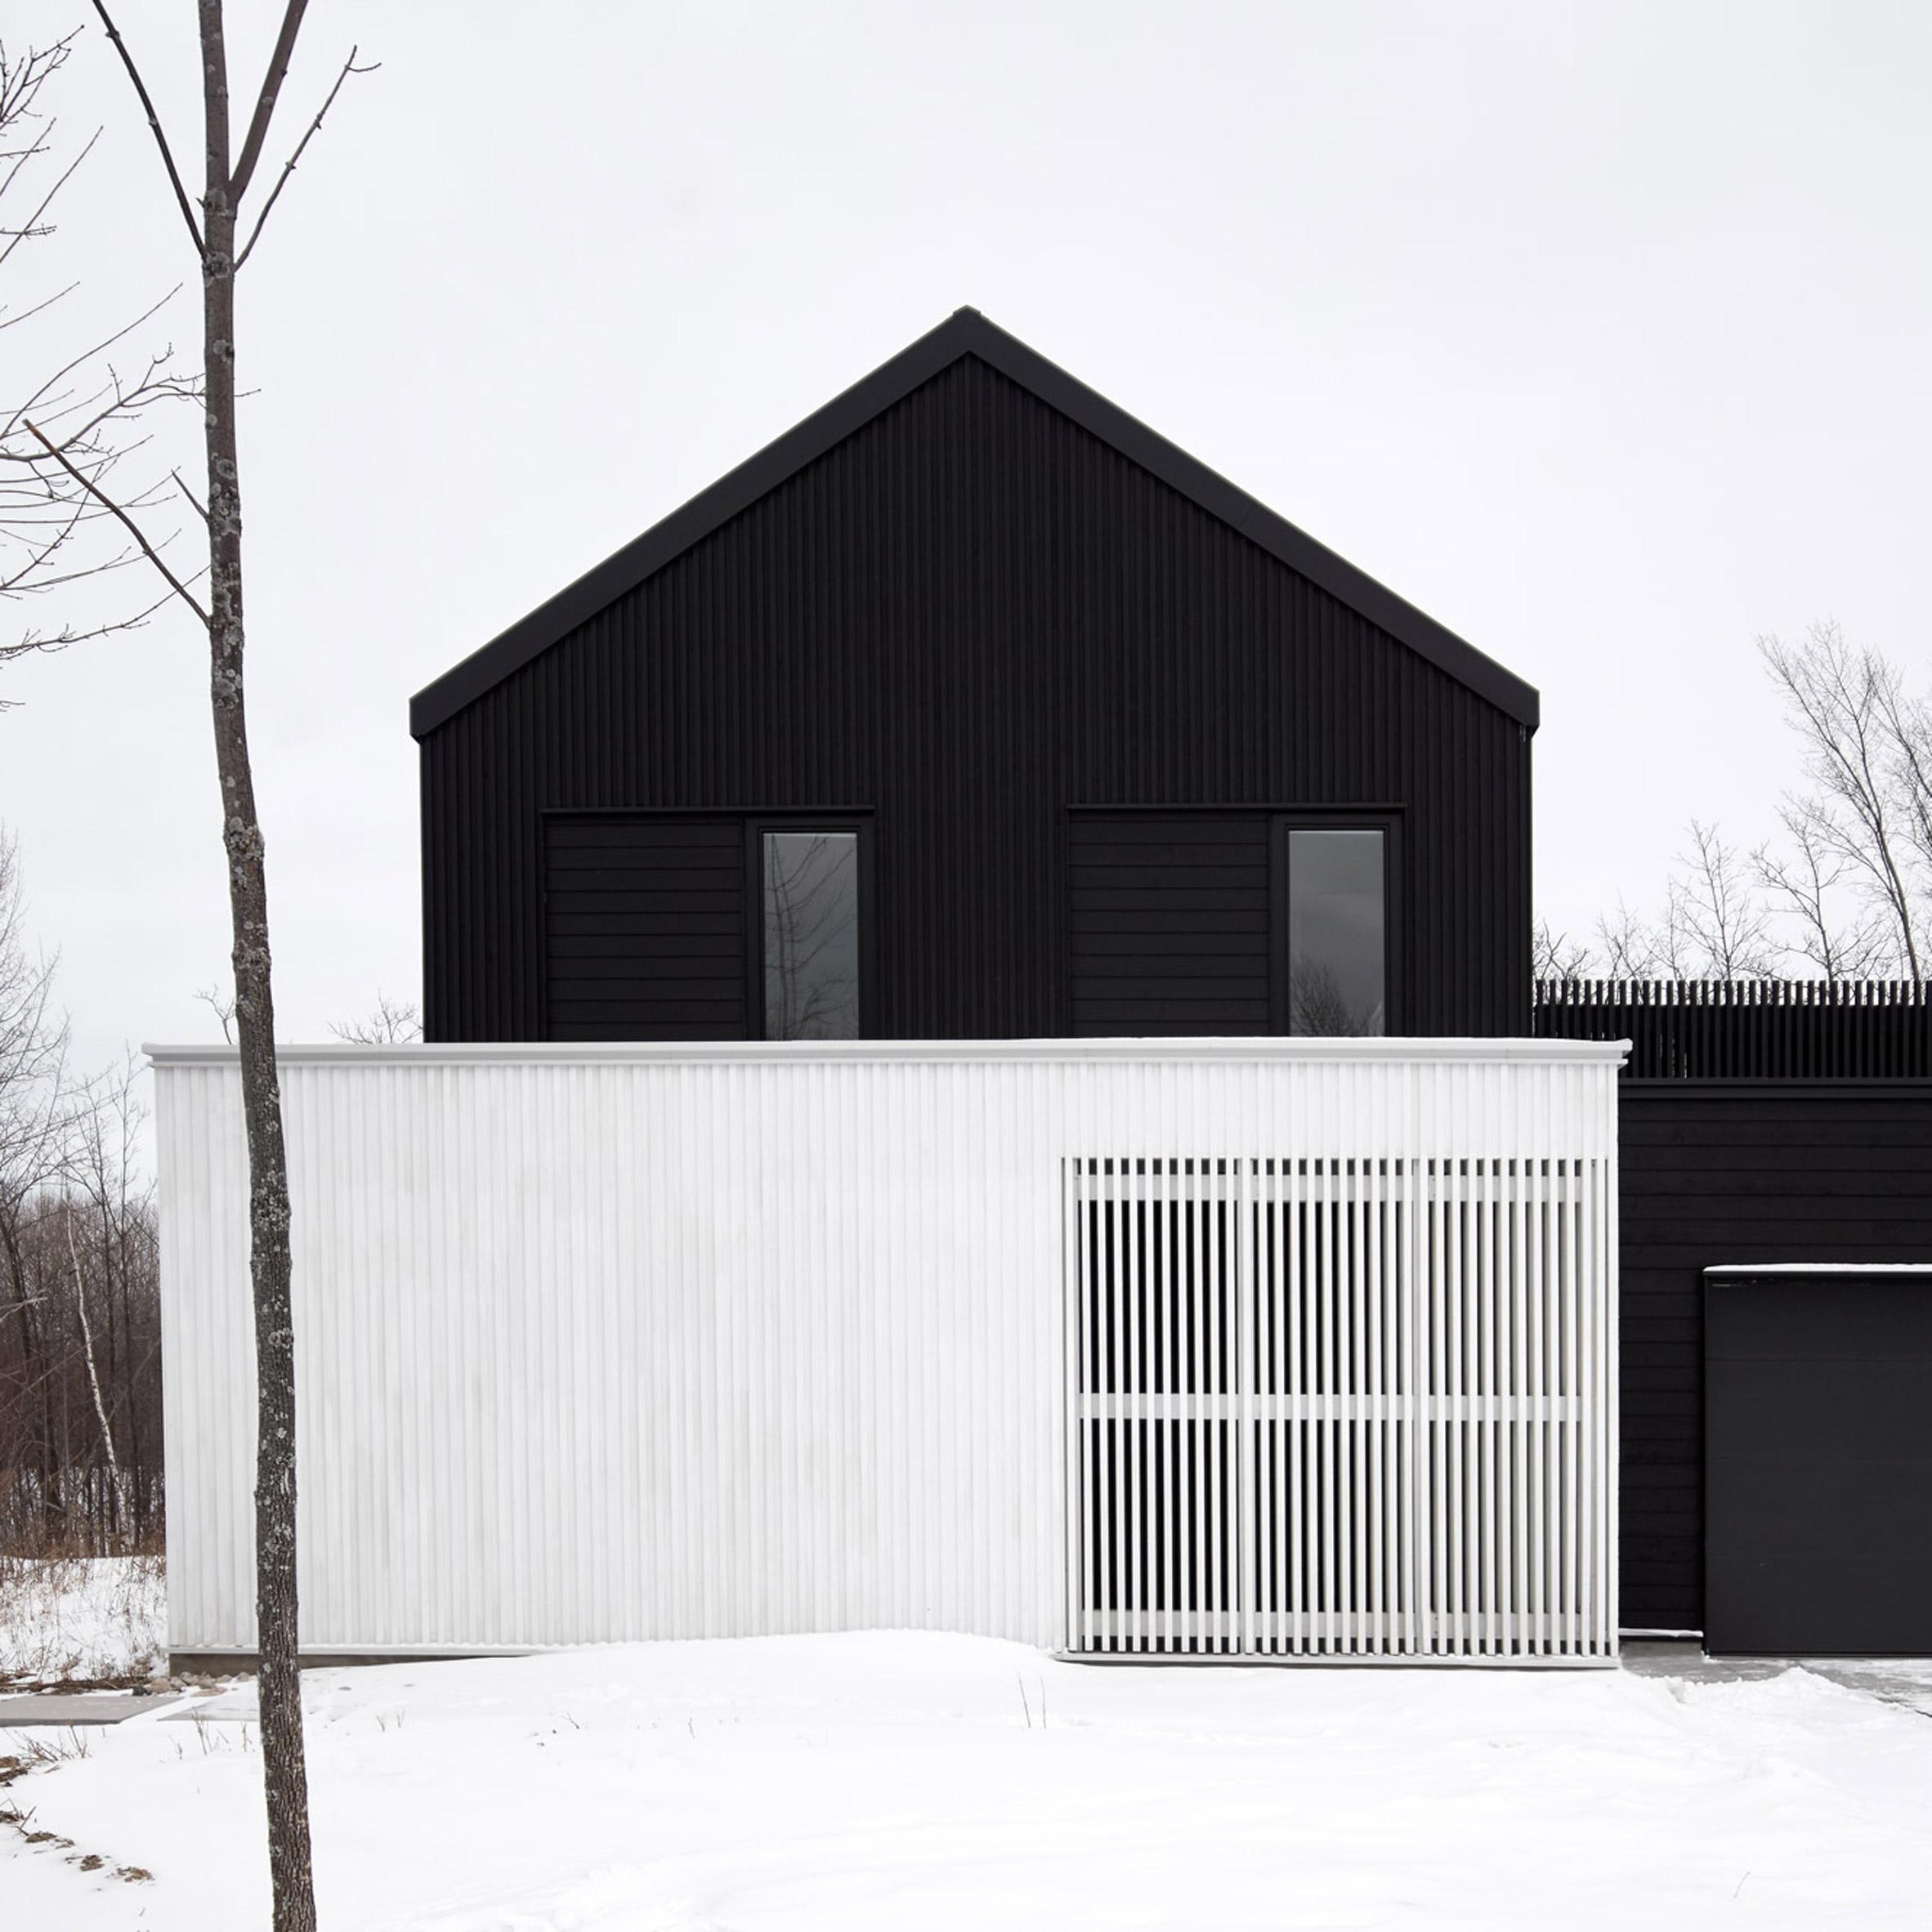 Uncategorized Black Facade houses with black exteriors dezeen monochrome canadian ski lodge by atelier kastelic buffey echoes traditional farmhouses